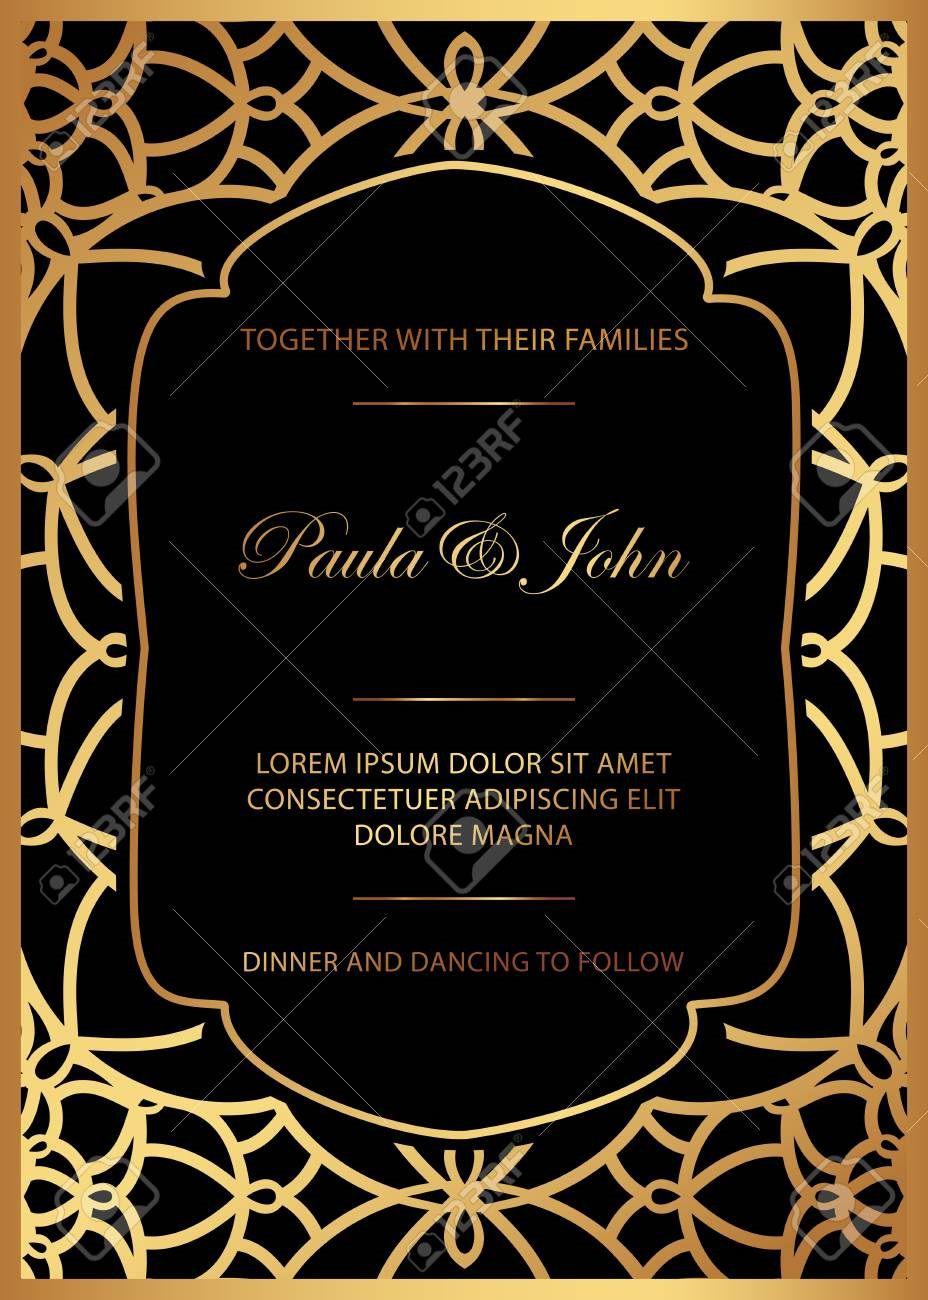 006 Breathtaking Black And Gold Invitation Template Idea  Design White Free PrintableFull